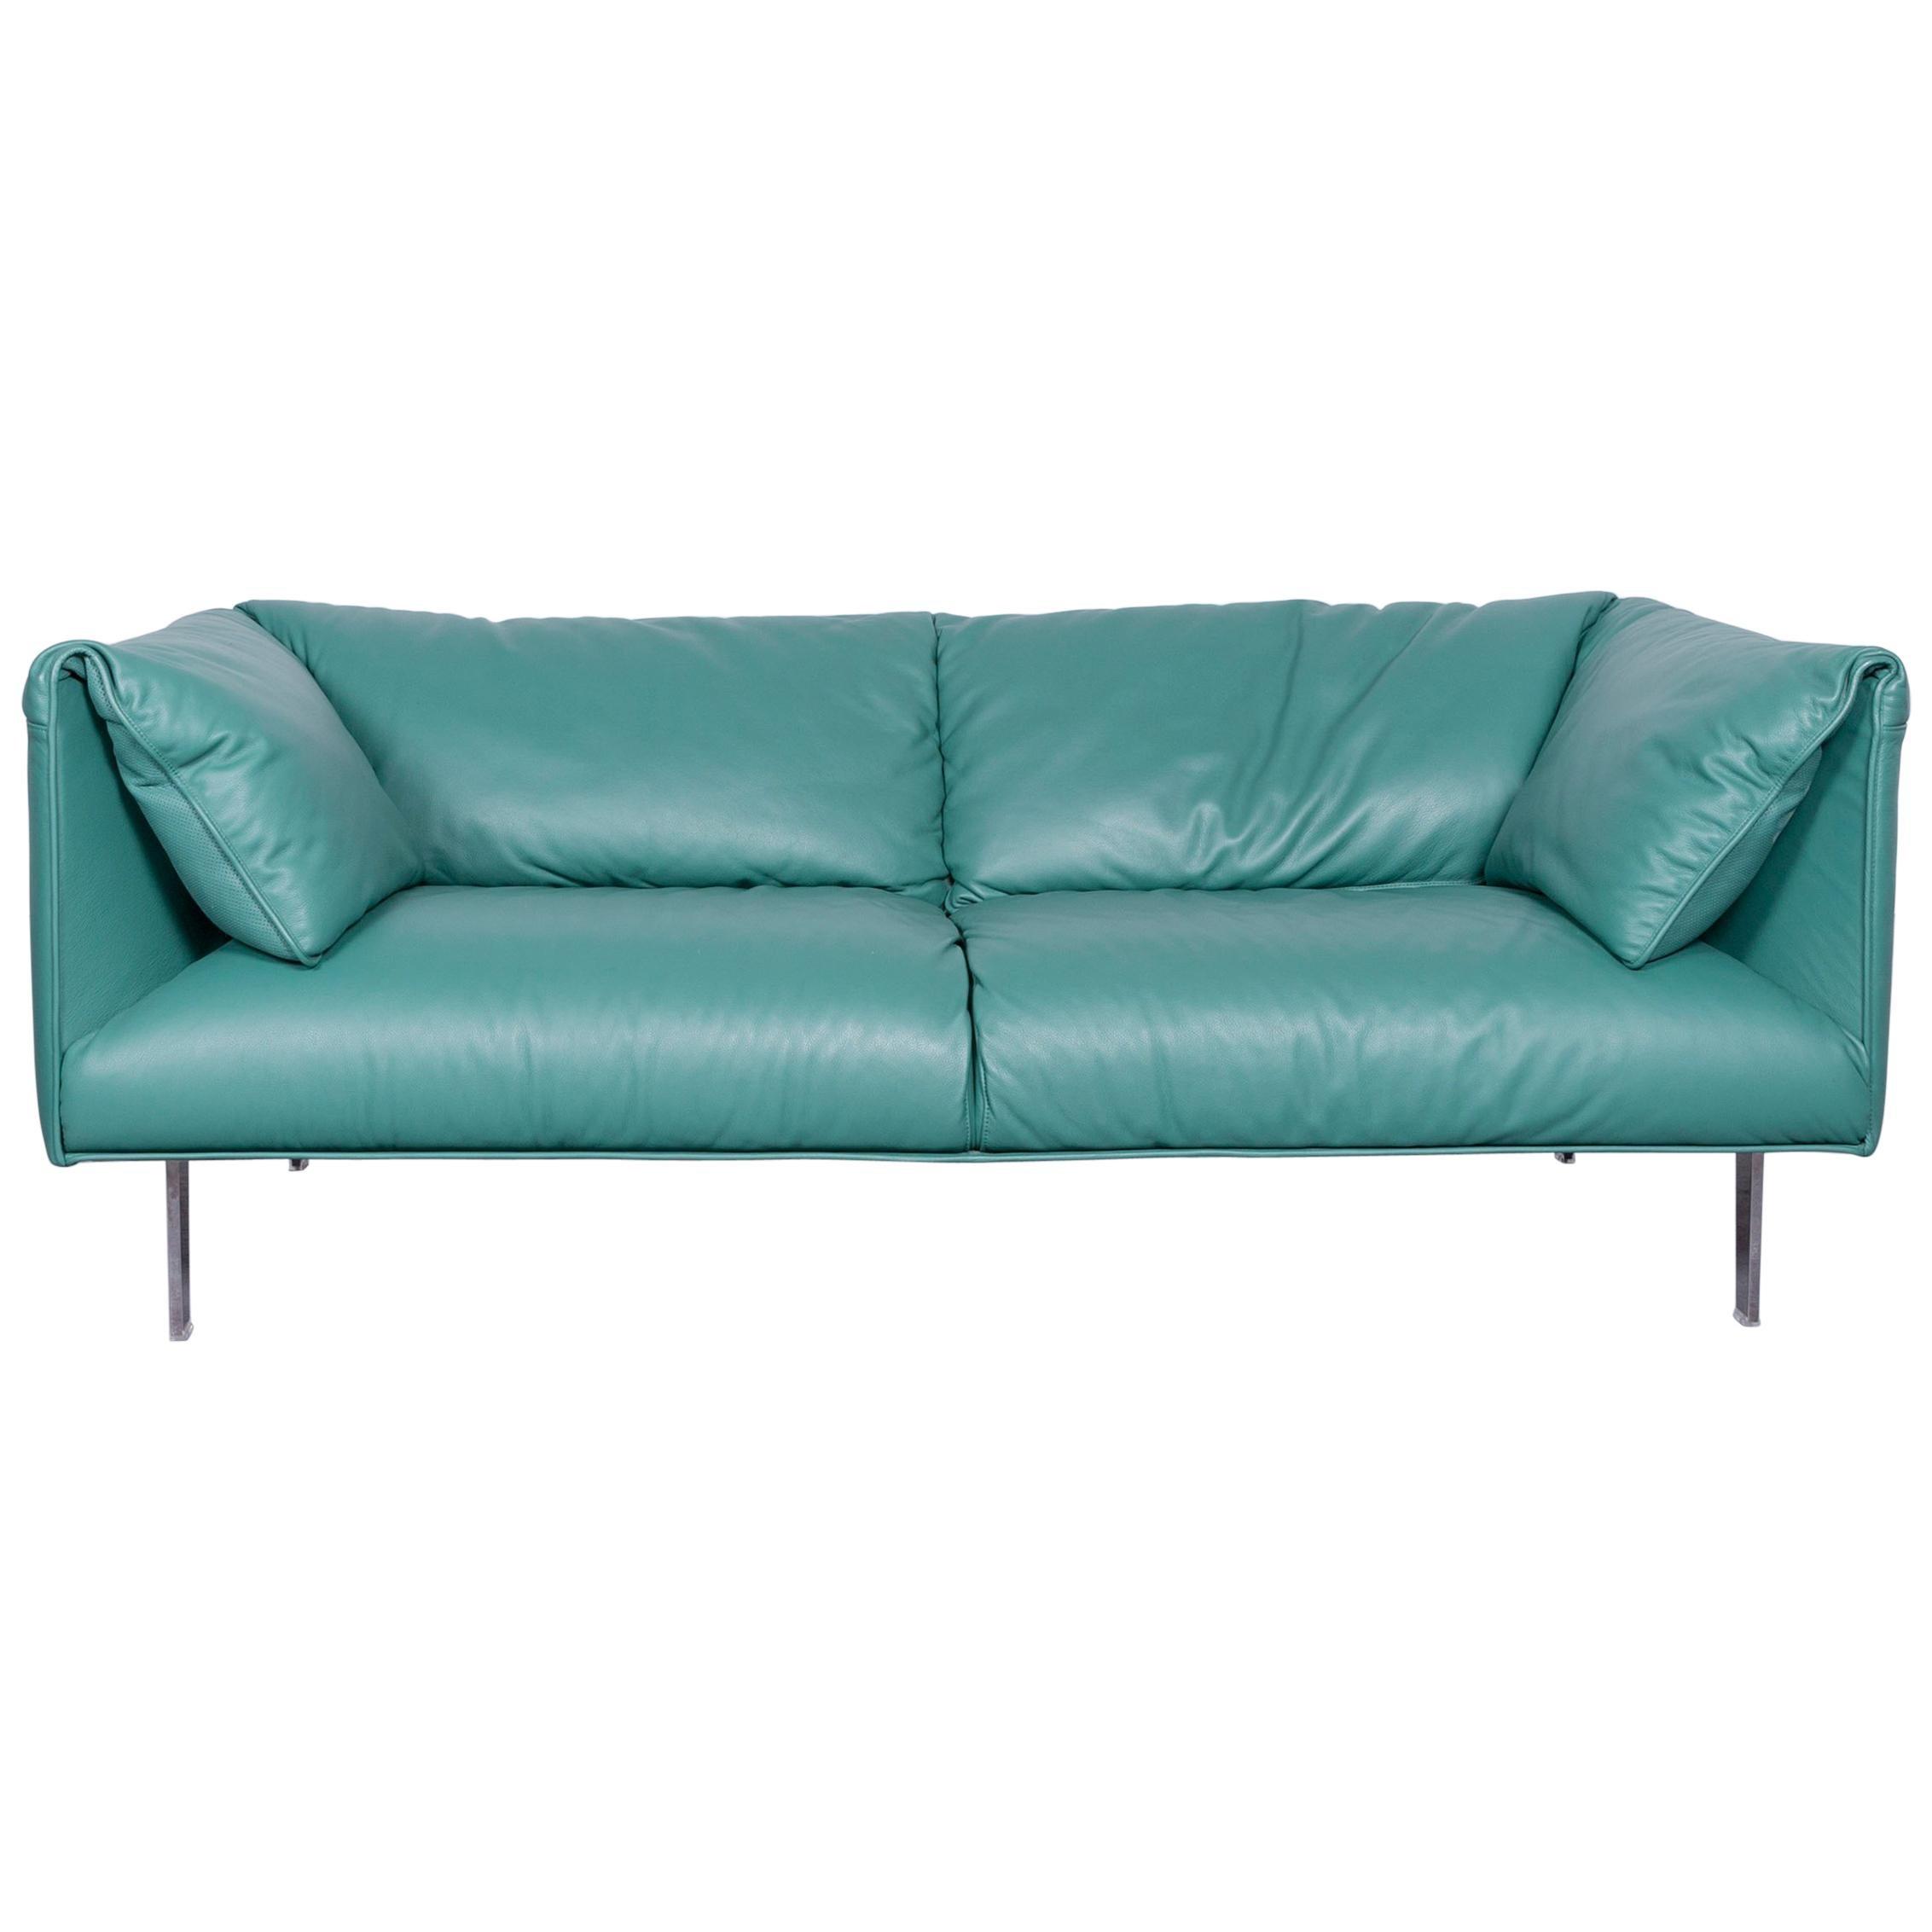 Poltrona Frau John John Designer Leather Sofa In Mint Two Seat